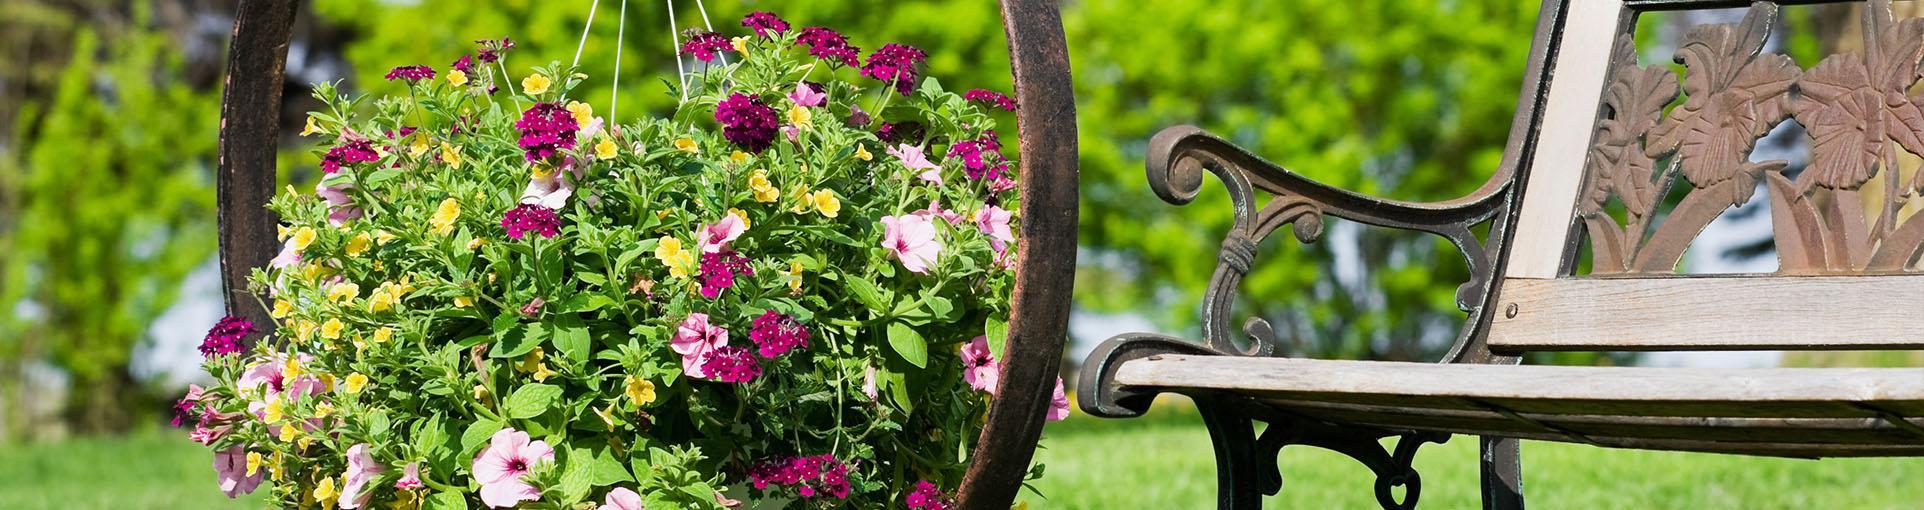 Ławka i kwiaty